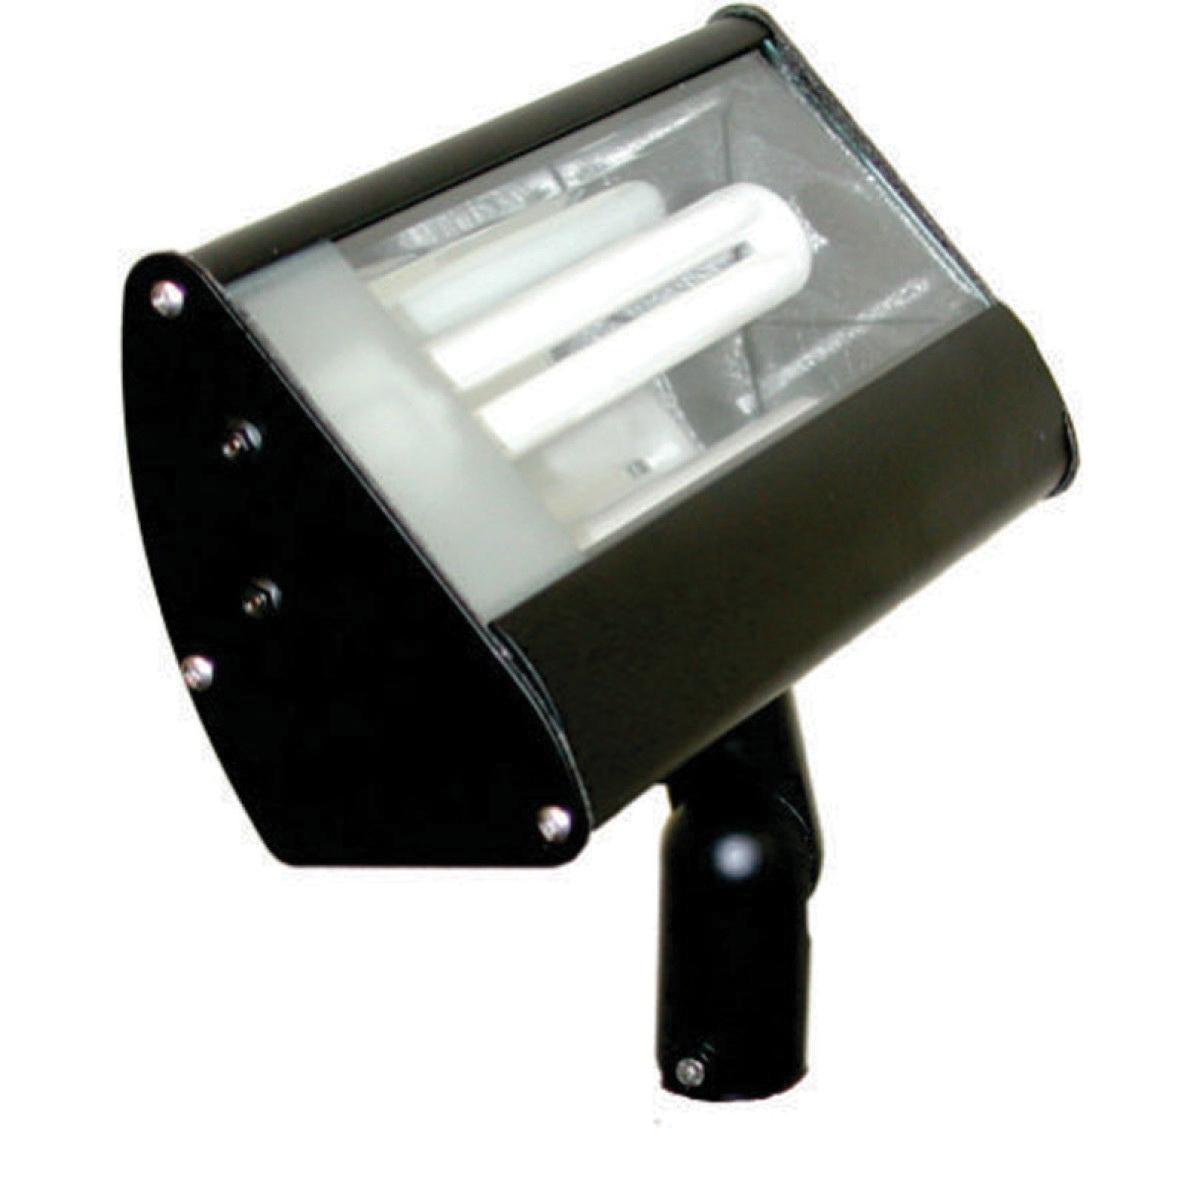 Orbit Industries S613-BK 1-Light Knuckle Mount Flood Light